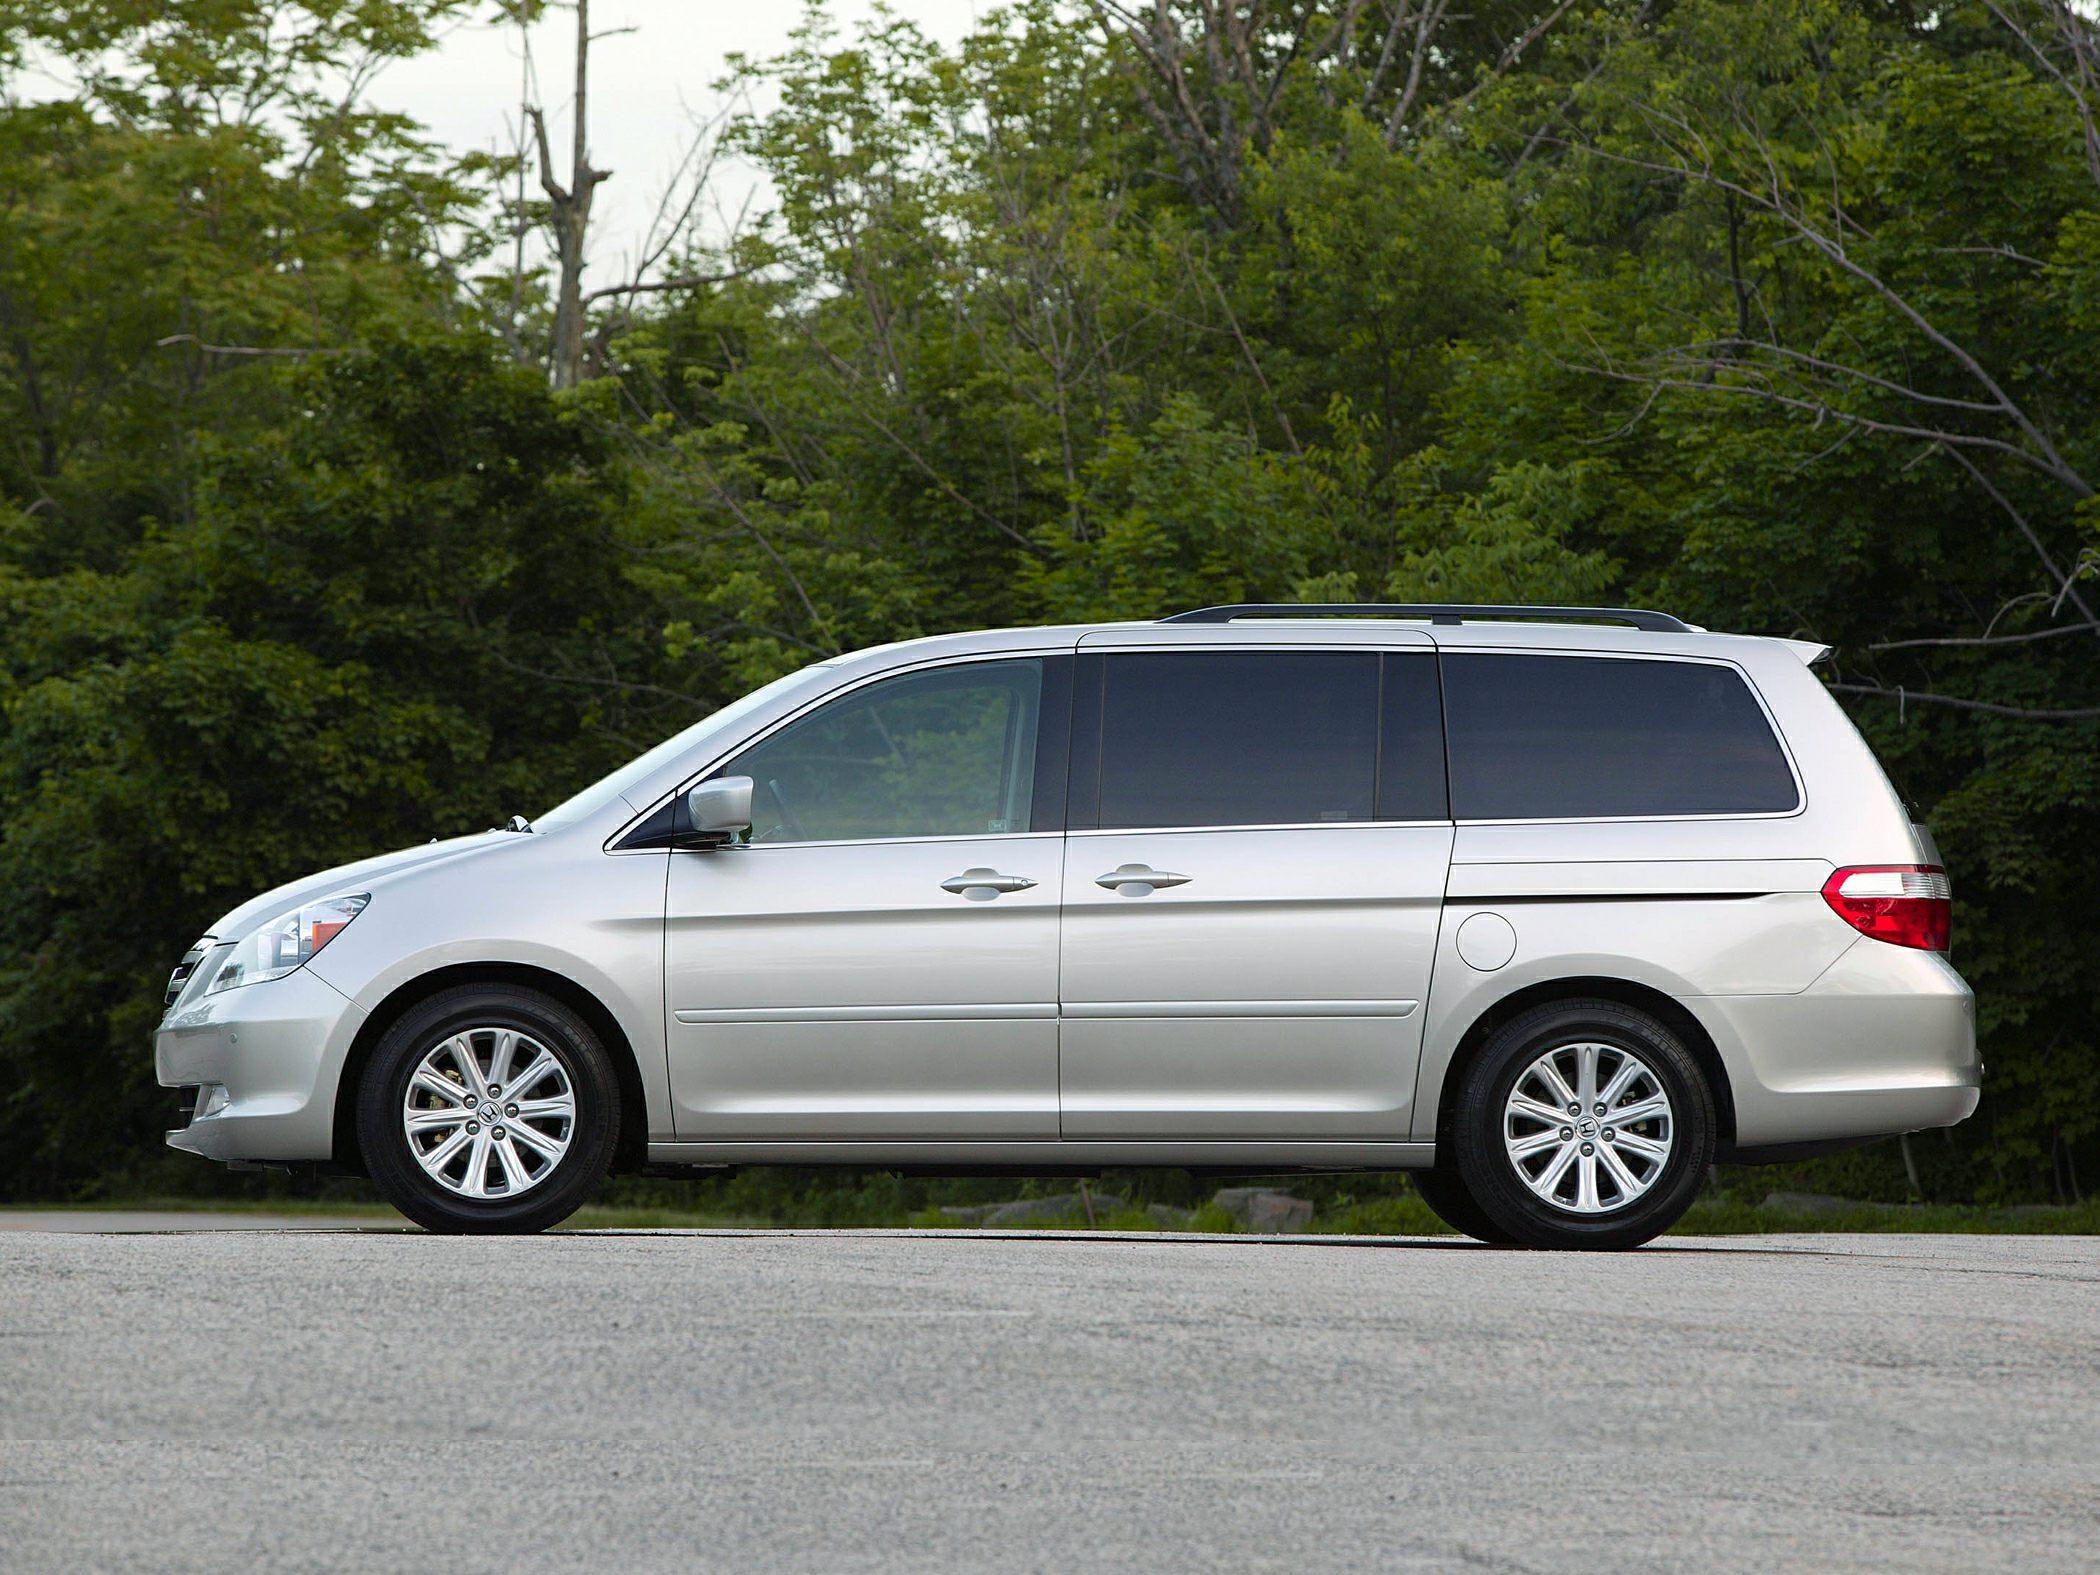 van wfwl door com dp odyssey ex specs reviews vehicles and images amazon honda